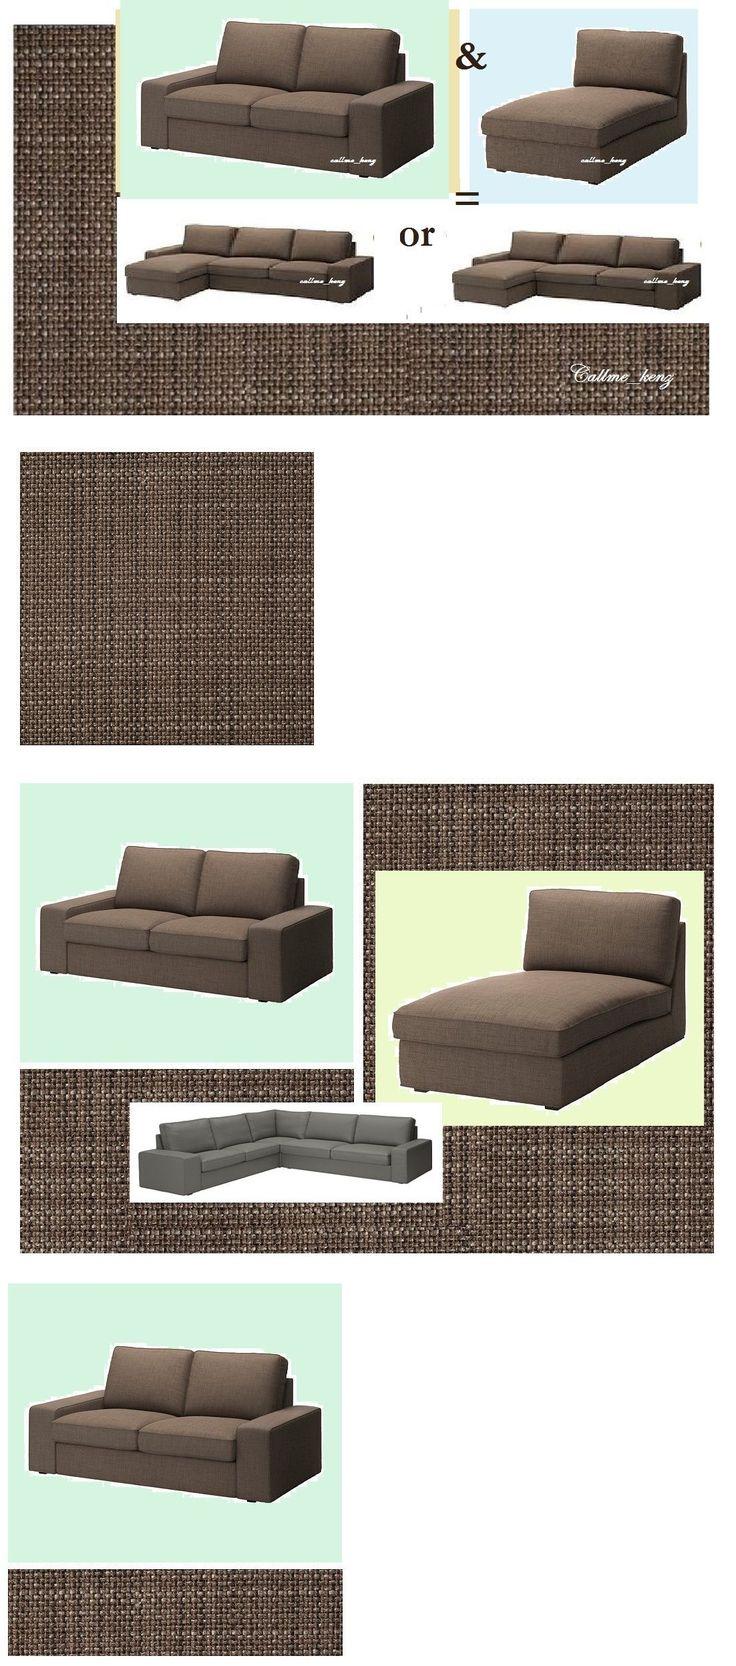 Custom ikea dining chair cover now available via comfort works - Slipcovers 175754 Ikea Kivik Loveseat 2 Seatandchaise Isunda Brown Sectional 3 Seat